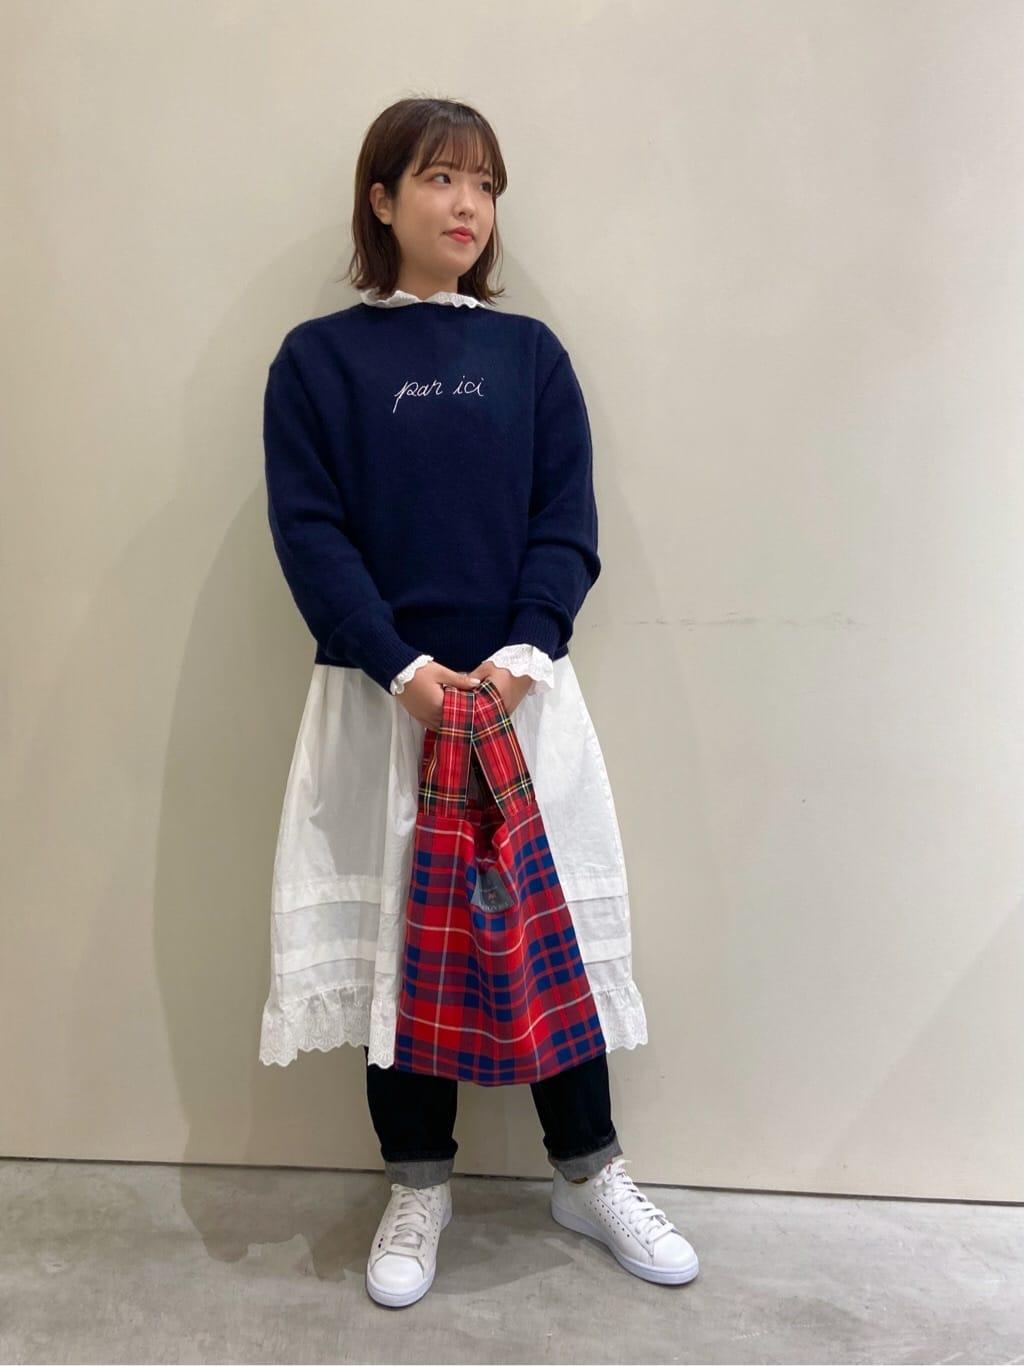 Dot and Stripes CHILD WOMAN CHILD WOMAN , PAR ICI 新宿ミロード 身長:160cm 2021.10.03